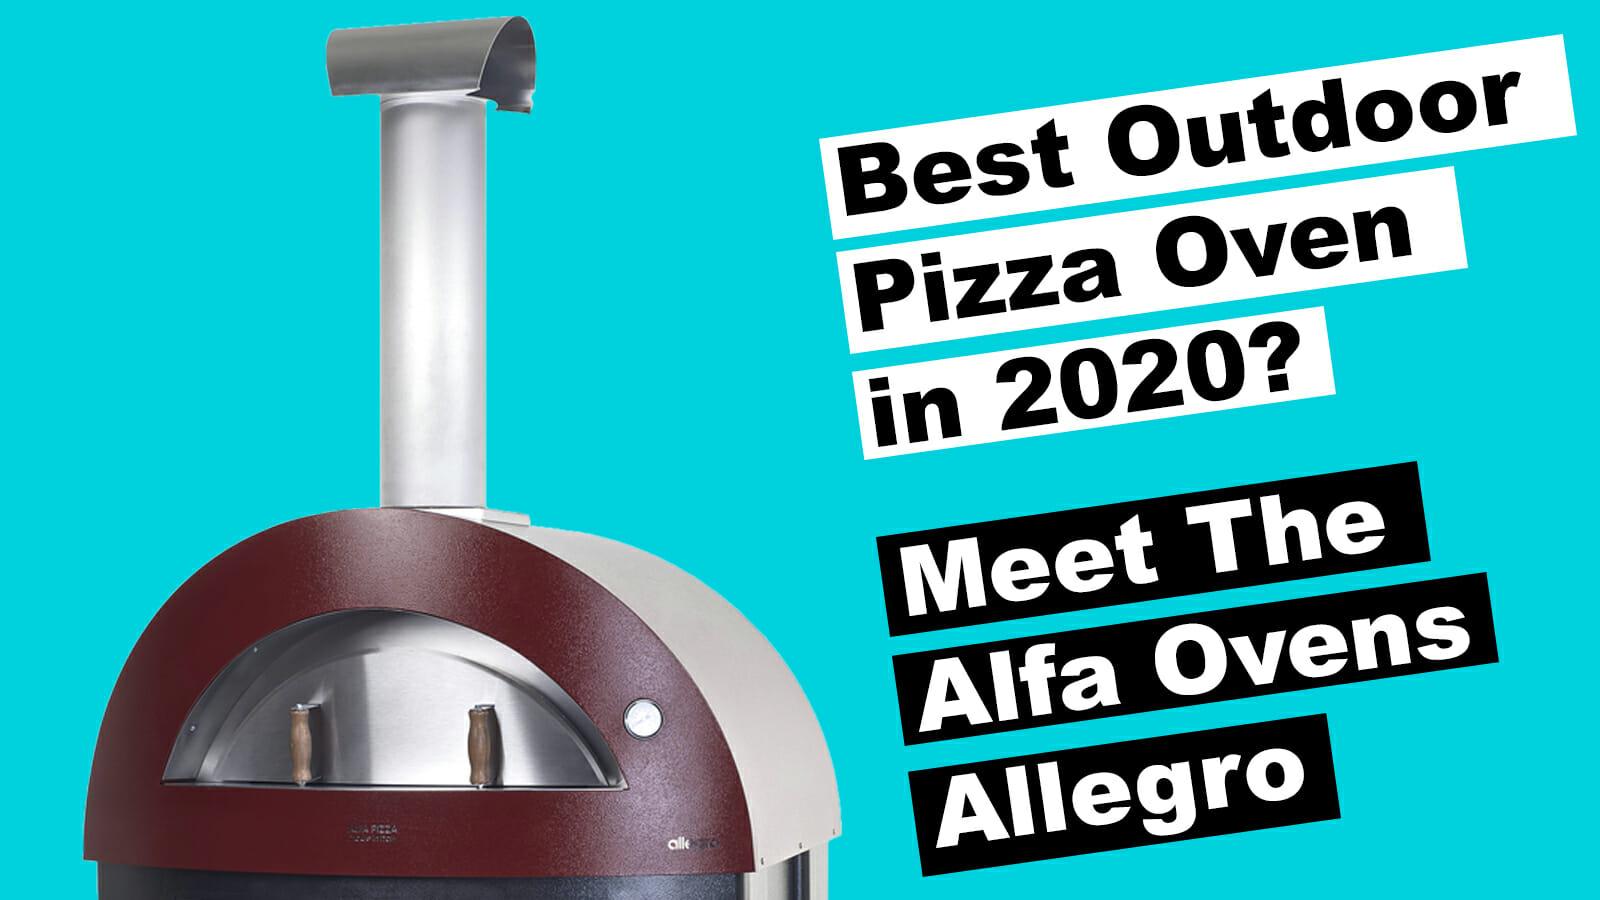 Alfa Ovens Allegro